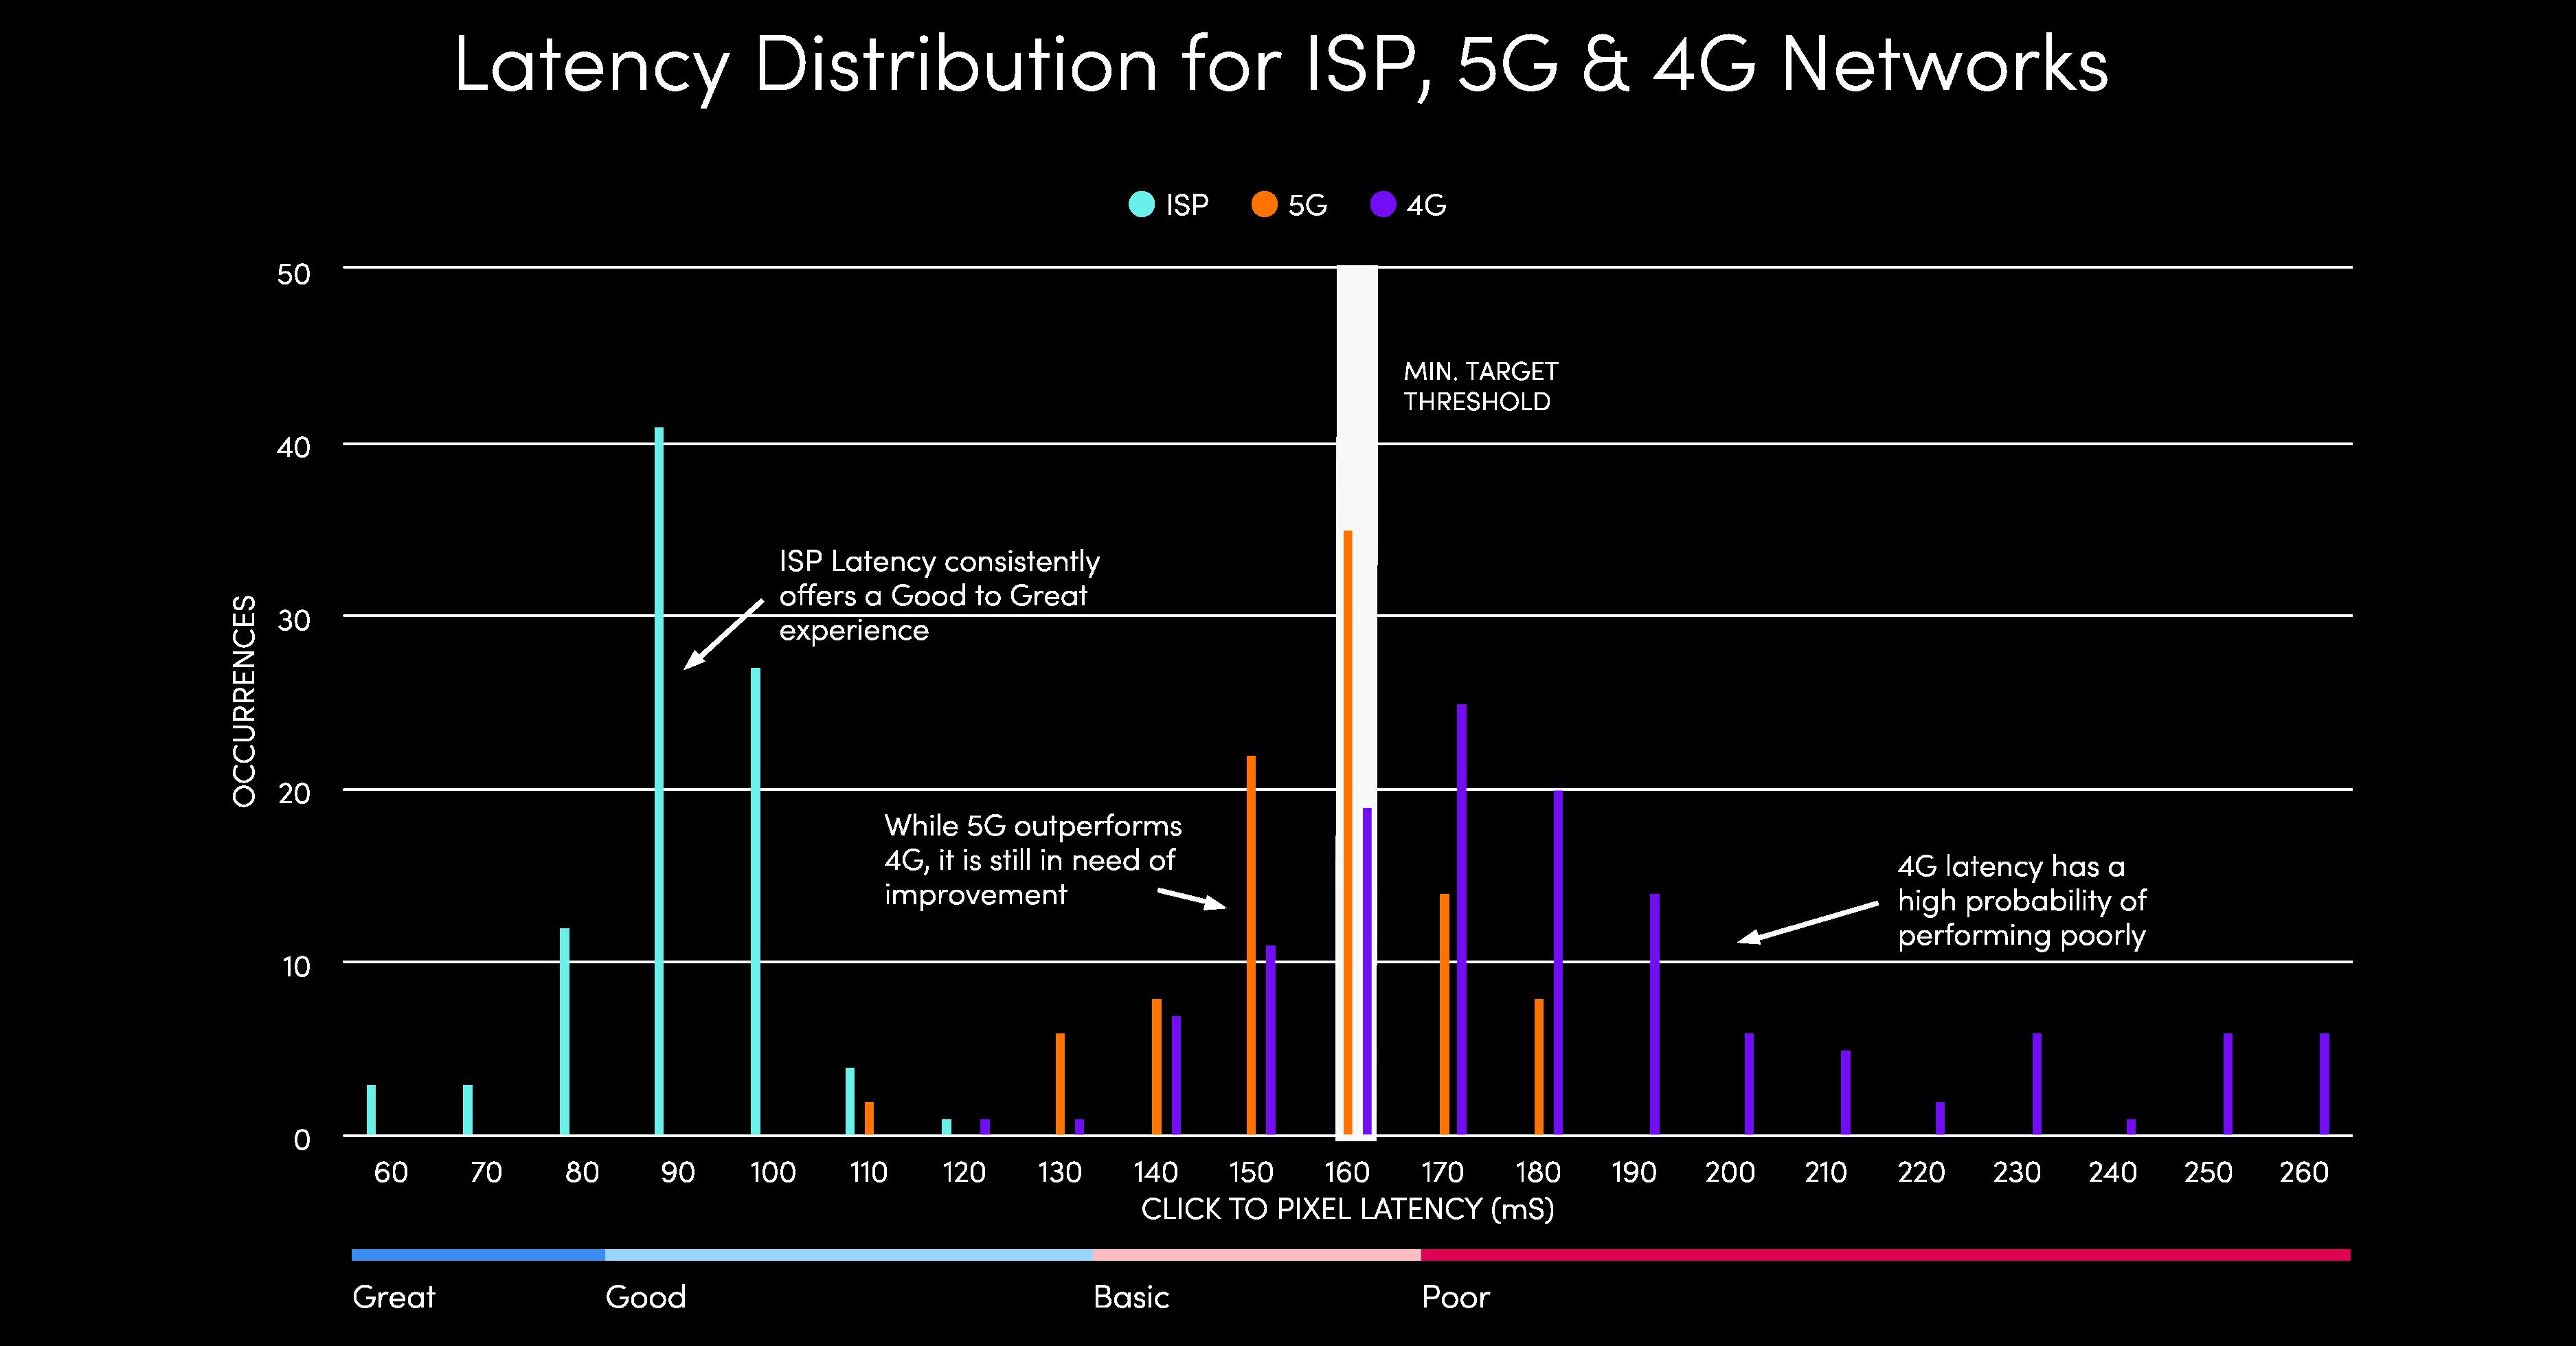 Latency Distribution of ISP vs 5G vs 4G Networks